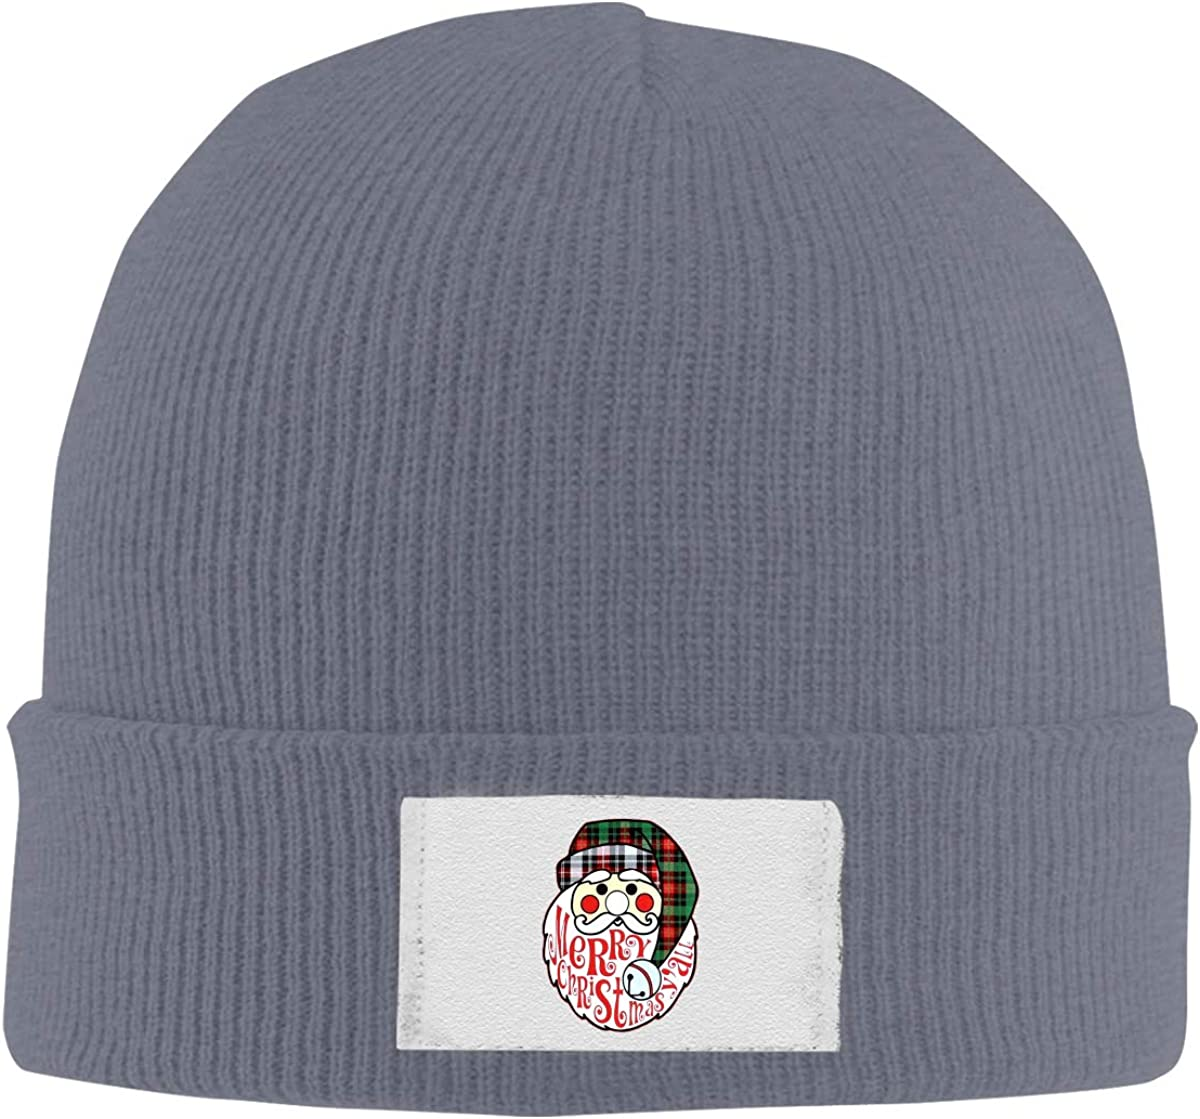 Stretchy Cuff Beanie Hat Black Skull Caps Plaid Santa Merry Christmas Winter Warm Knit Hats